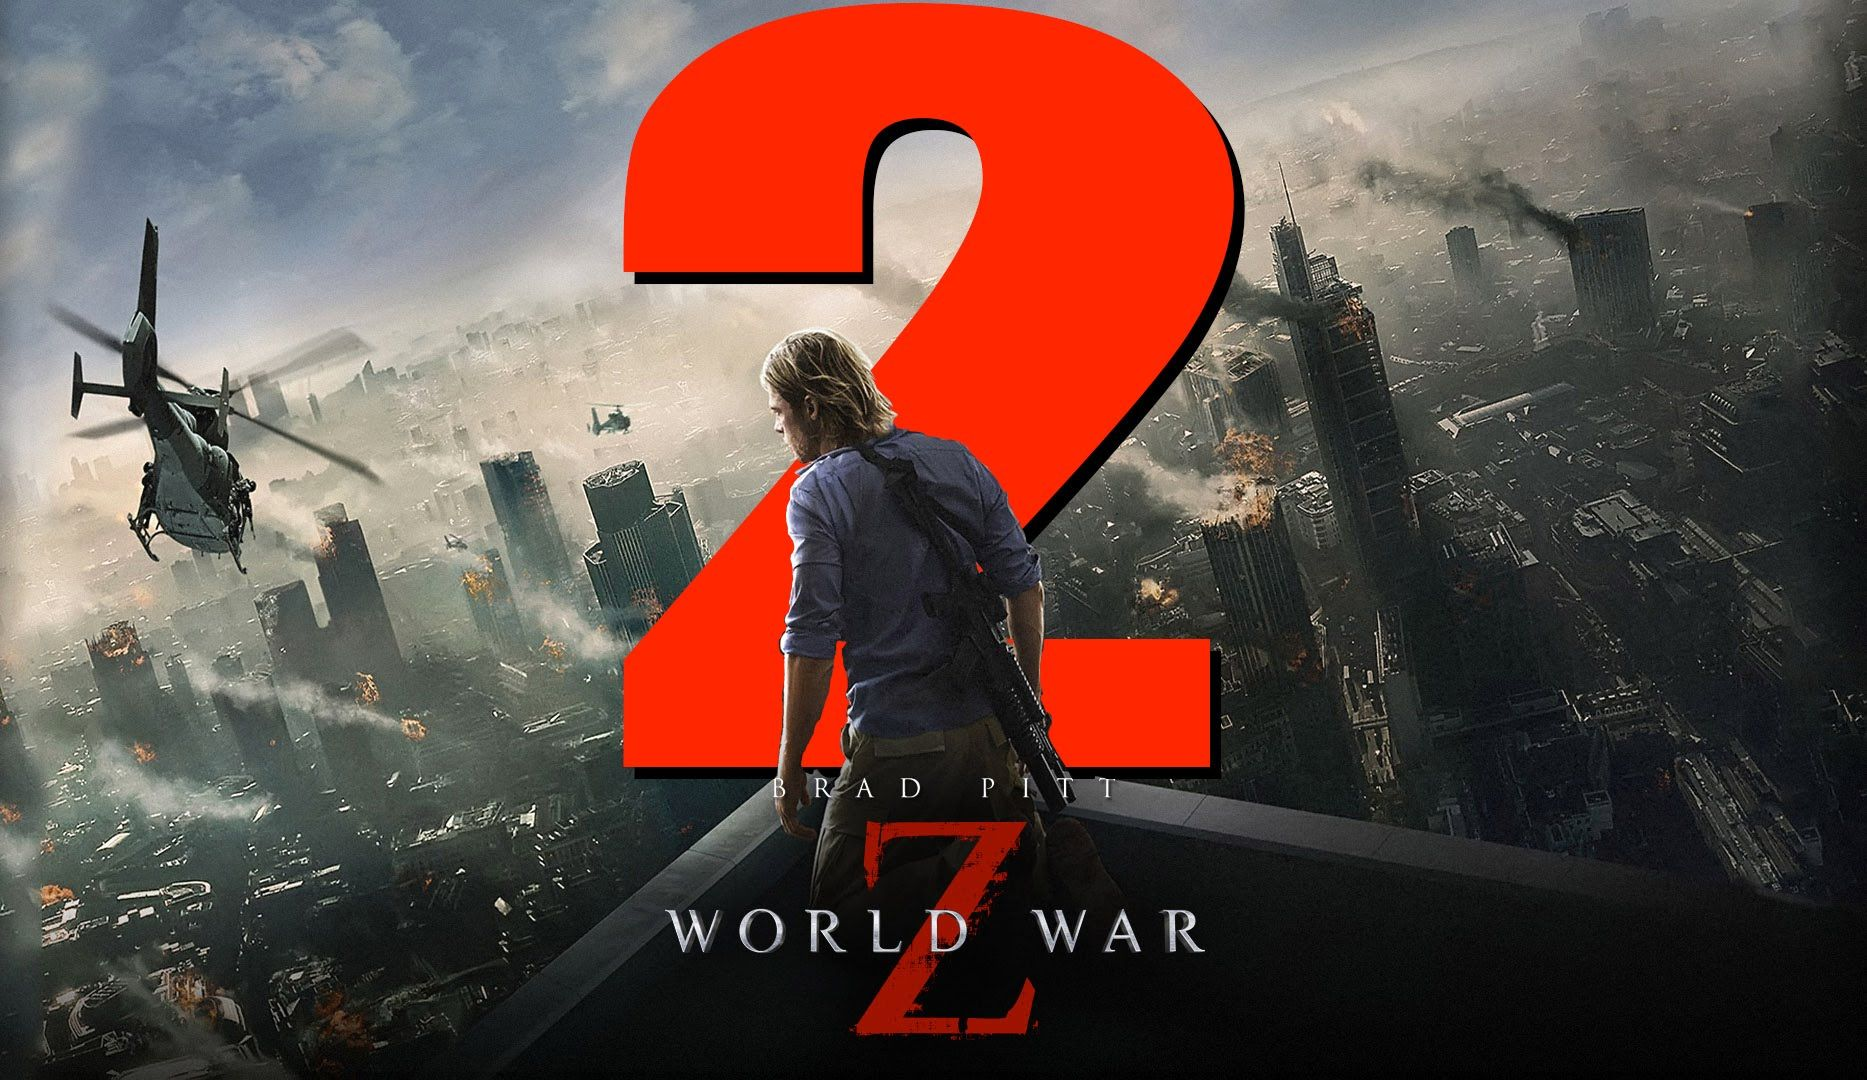 World War Z 2 Not To Release In 2017 David Fincher